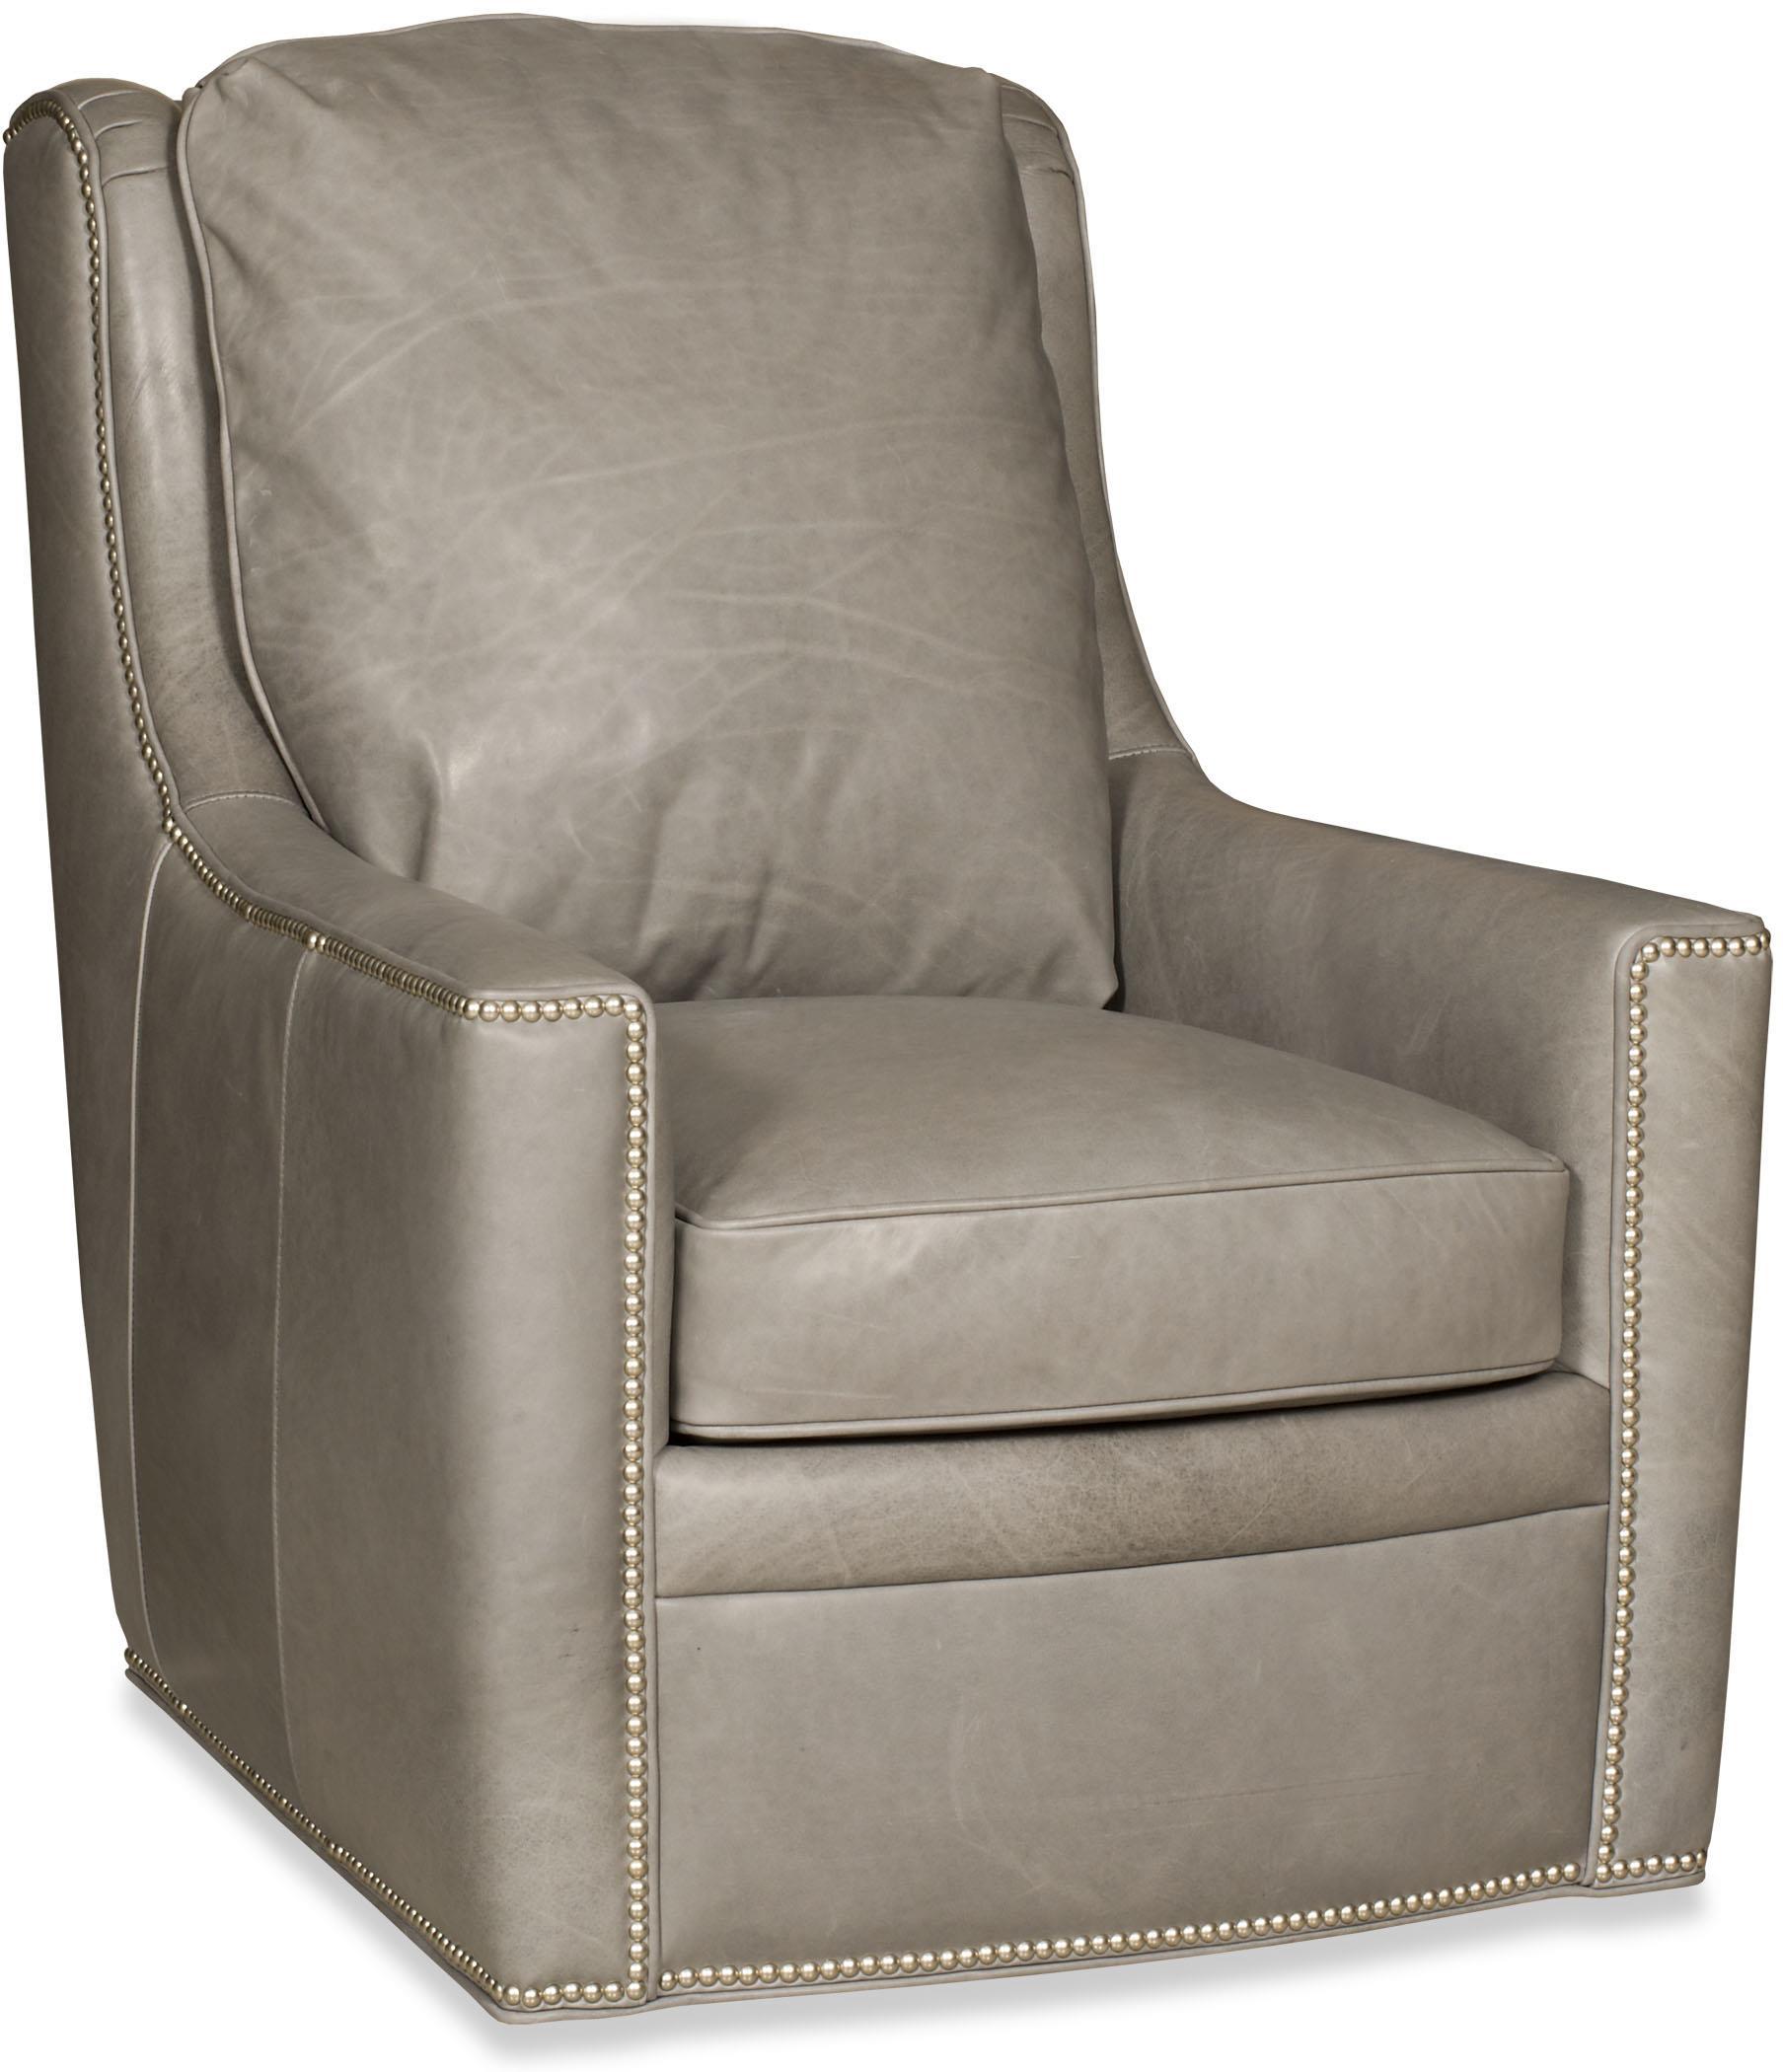 Bradington Young Swivel Tub Chairs Percy Swivel Tub Chair